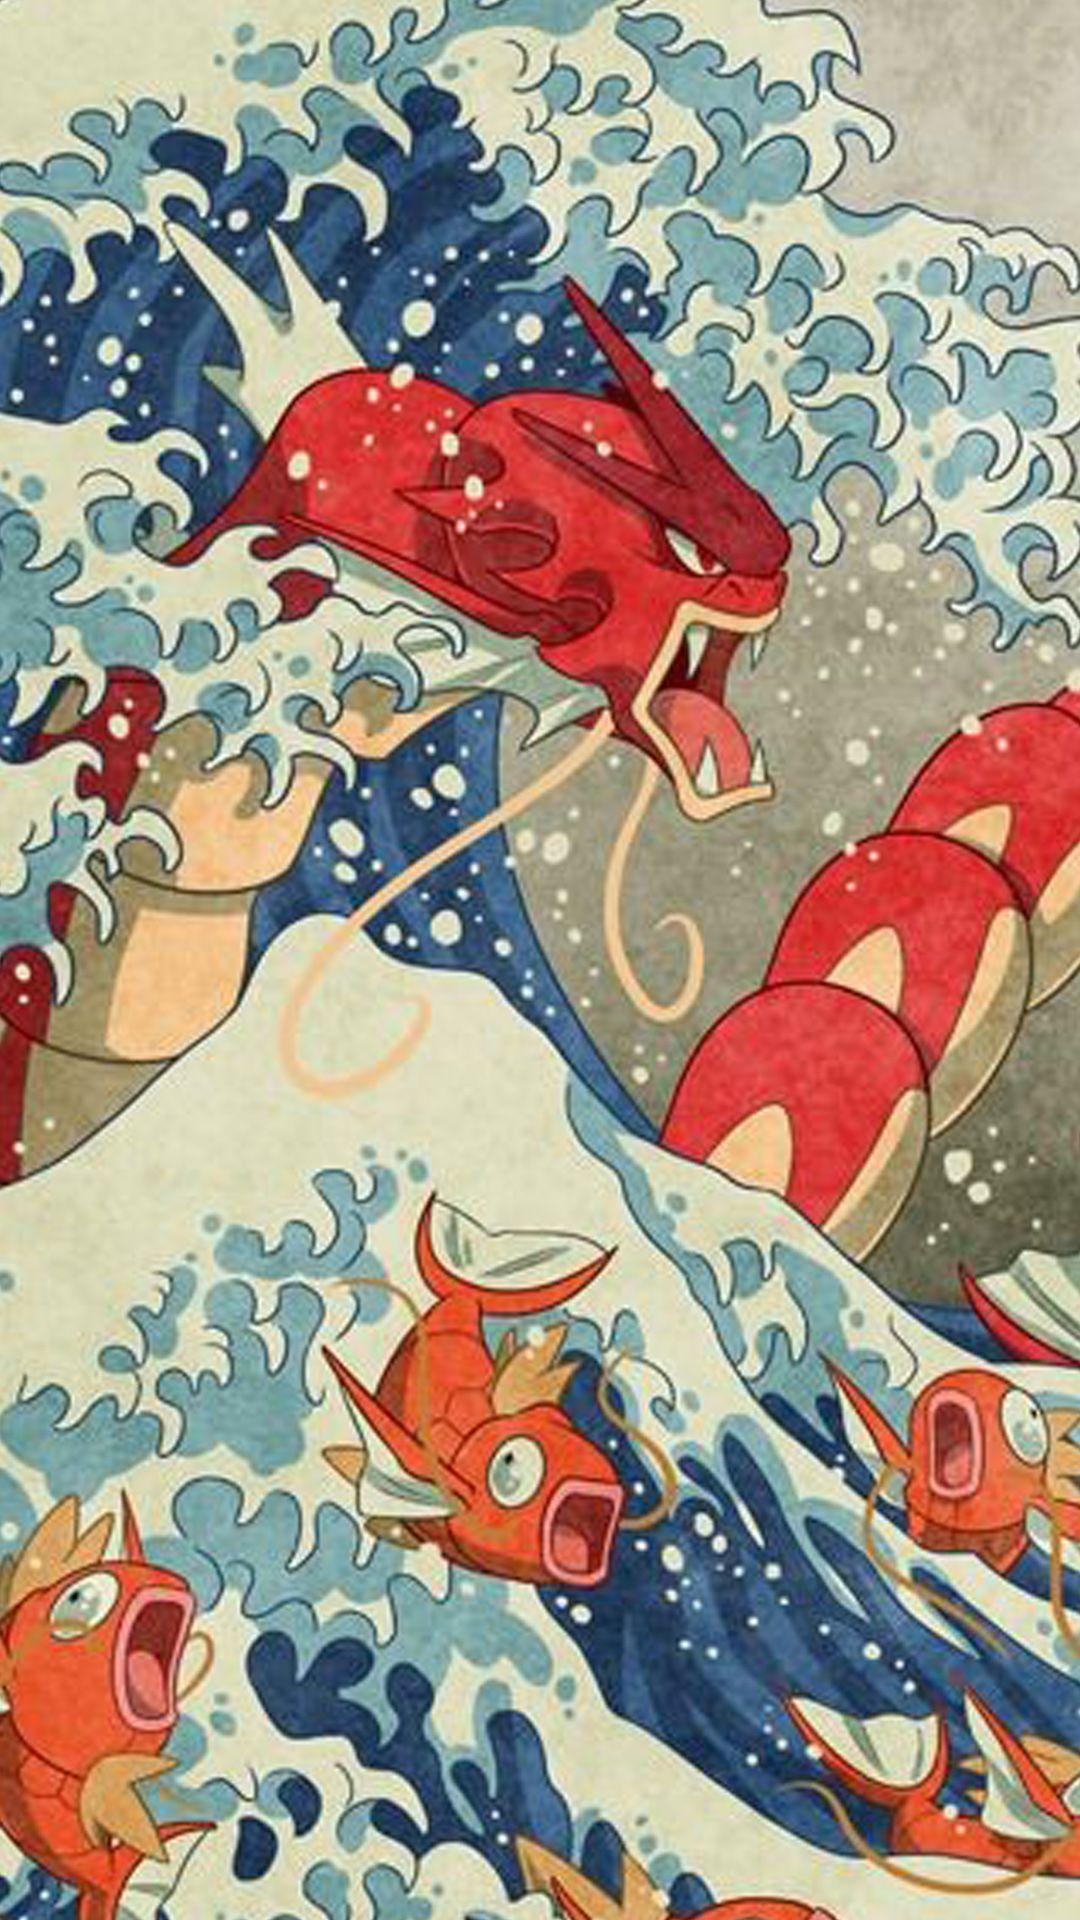 Pokemon Indigo League Wallpapers Wallpaper Cave